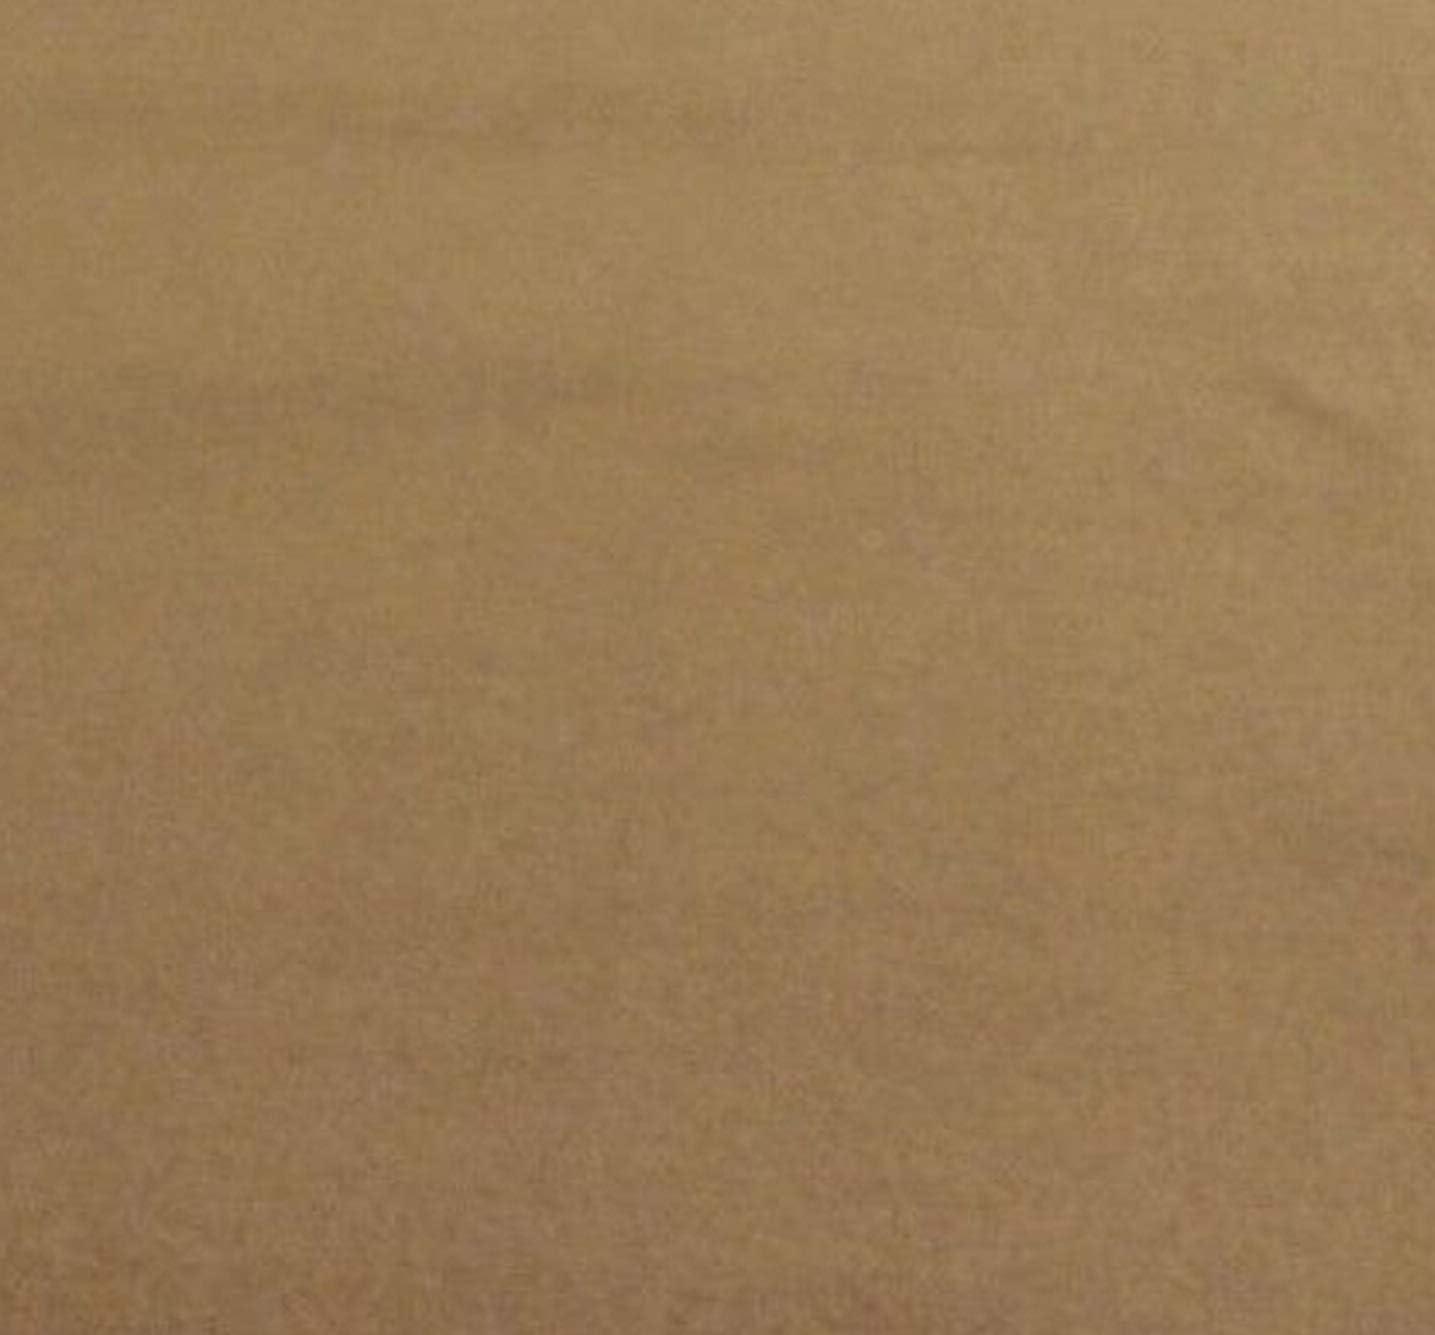 5 Yards Top Quality Medium Prairie Tan Unbacked Automotive Carpet Flexible 18 OZ 80 Wide #CFAS